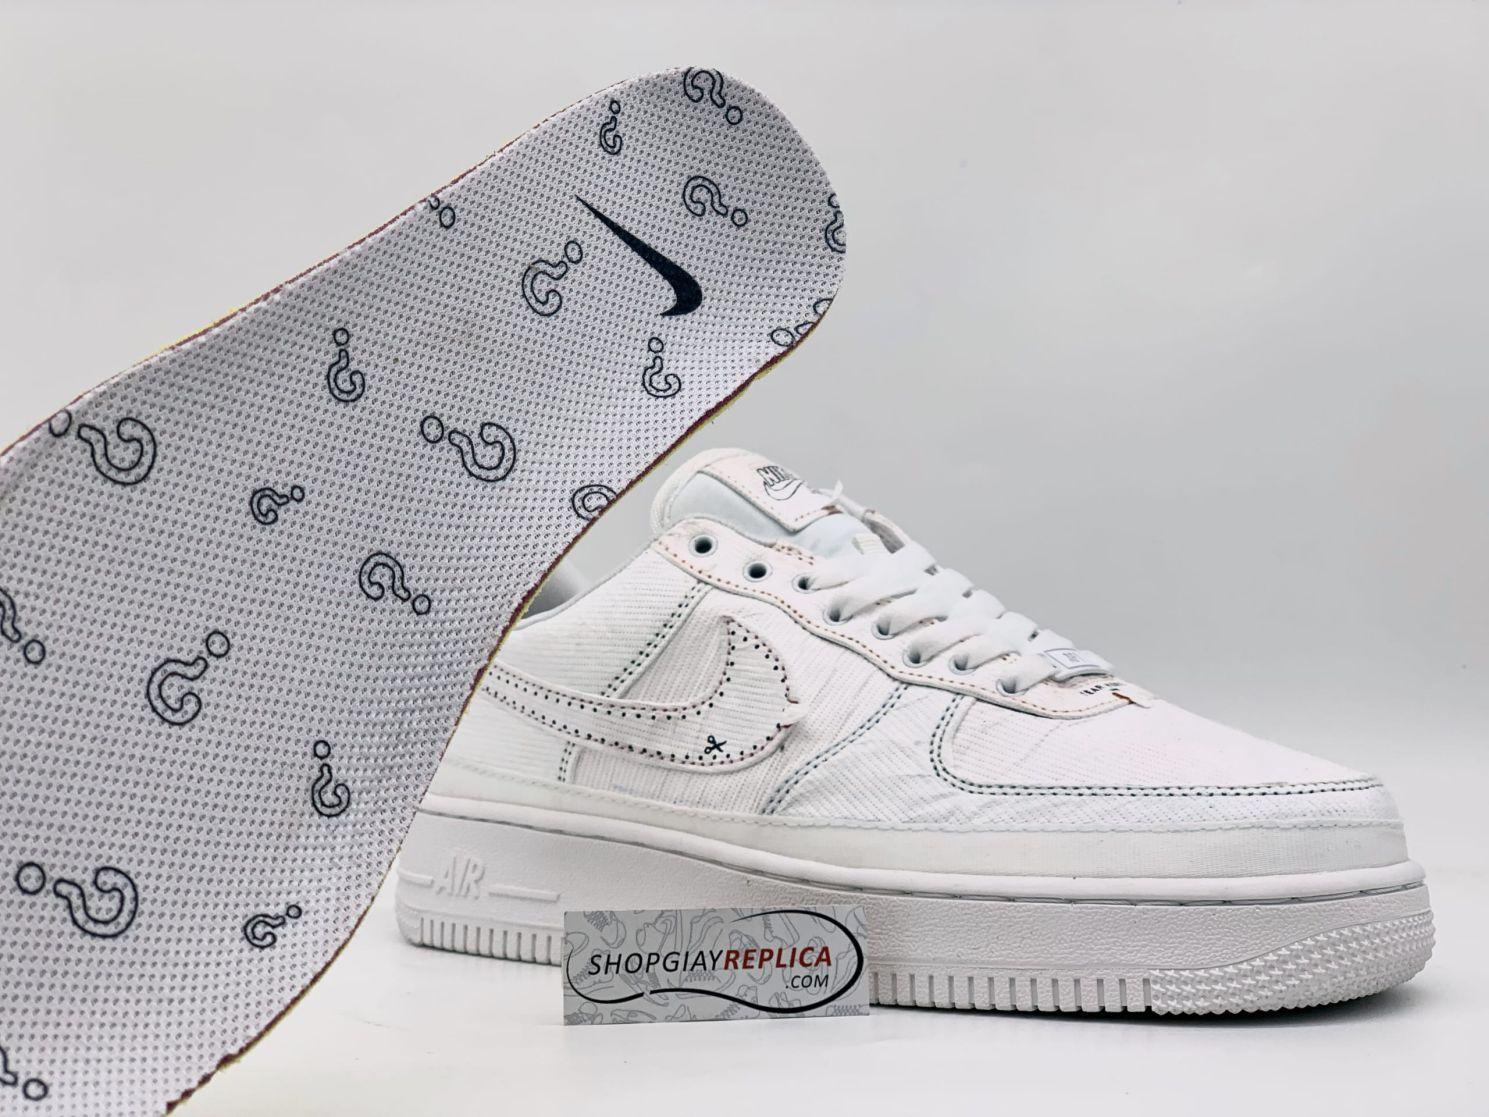 Lót Nike Air Force 1 LX Tear Away Red Swoosh